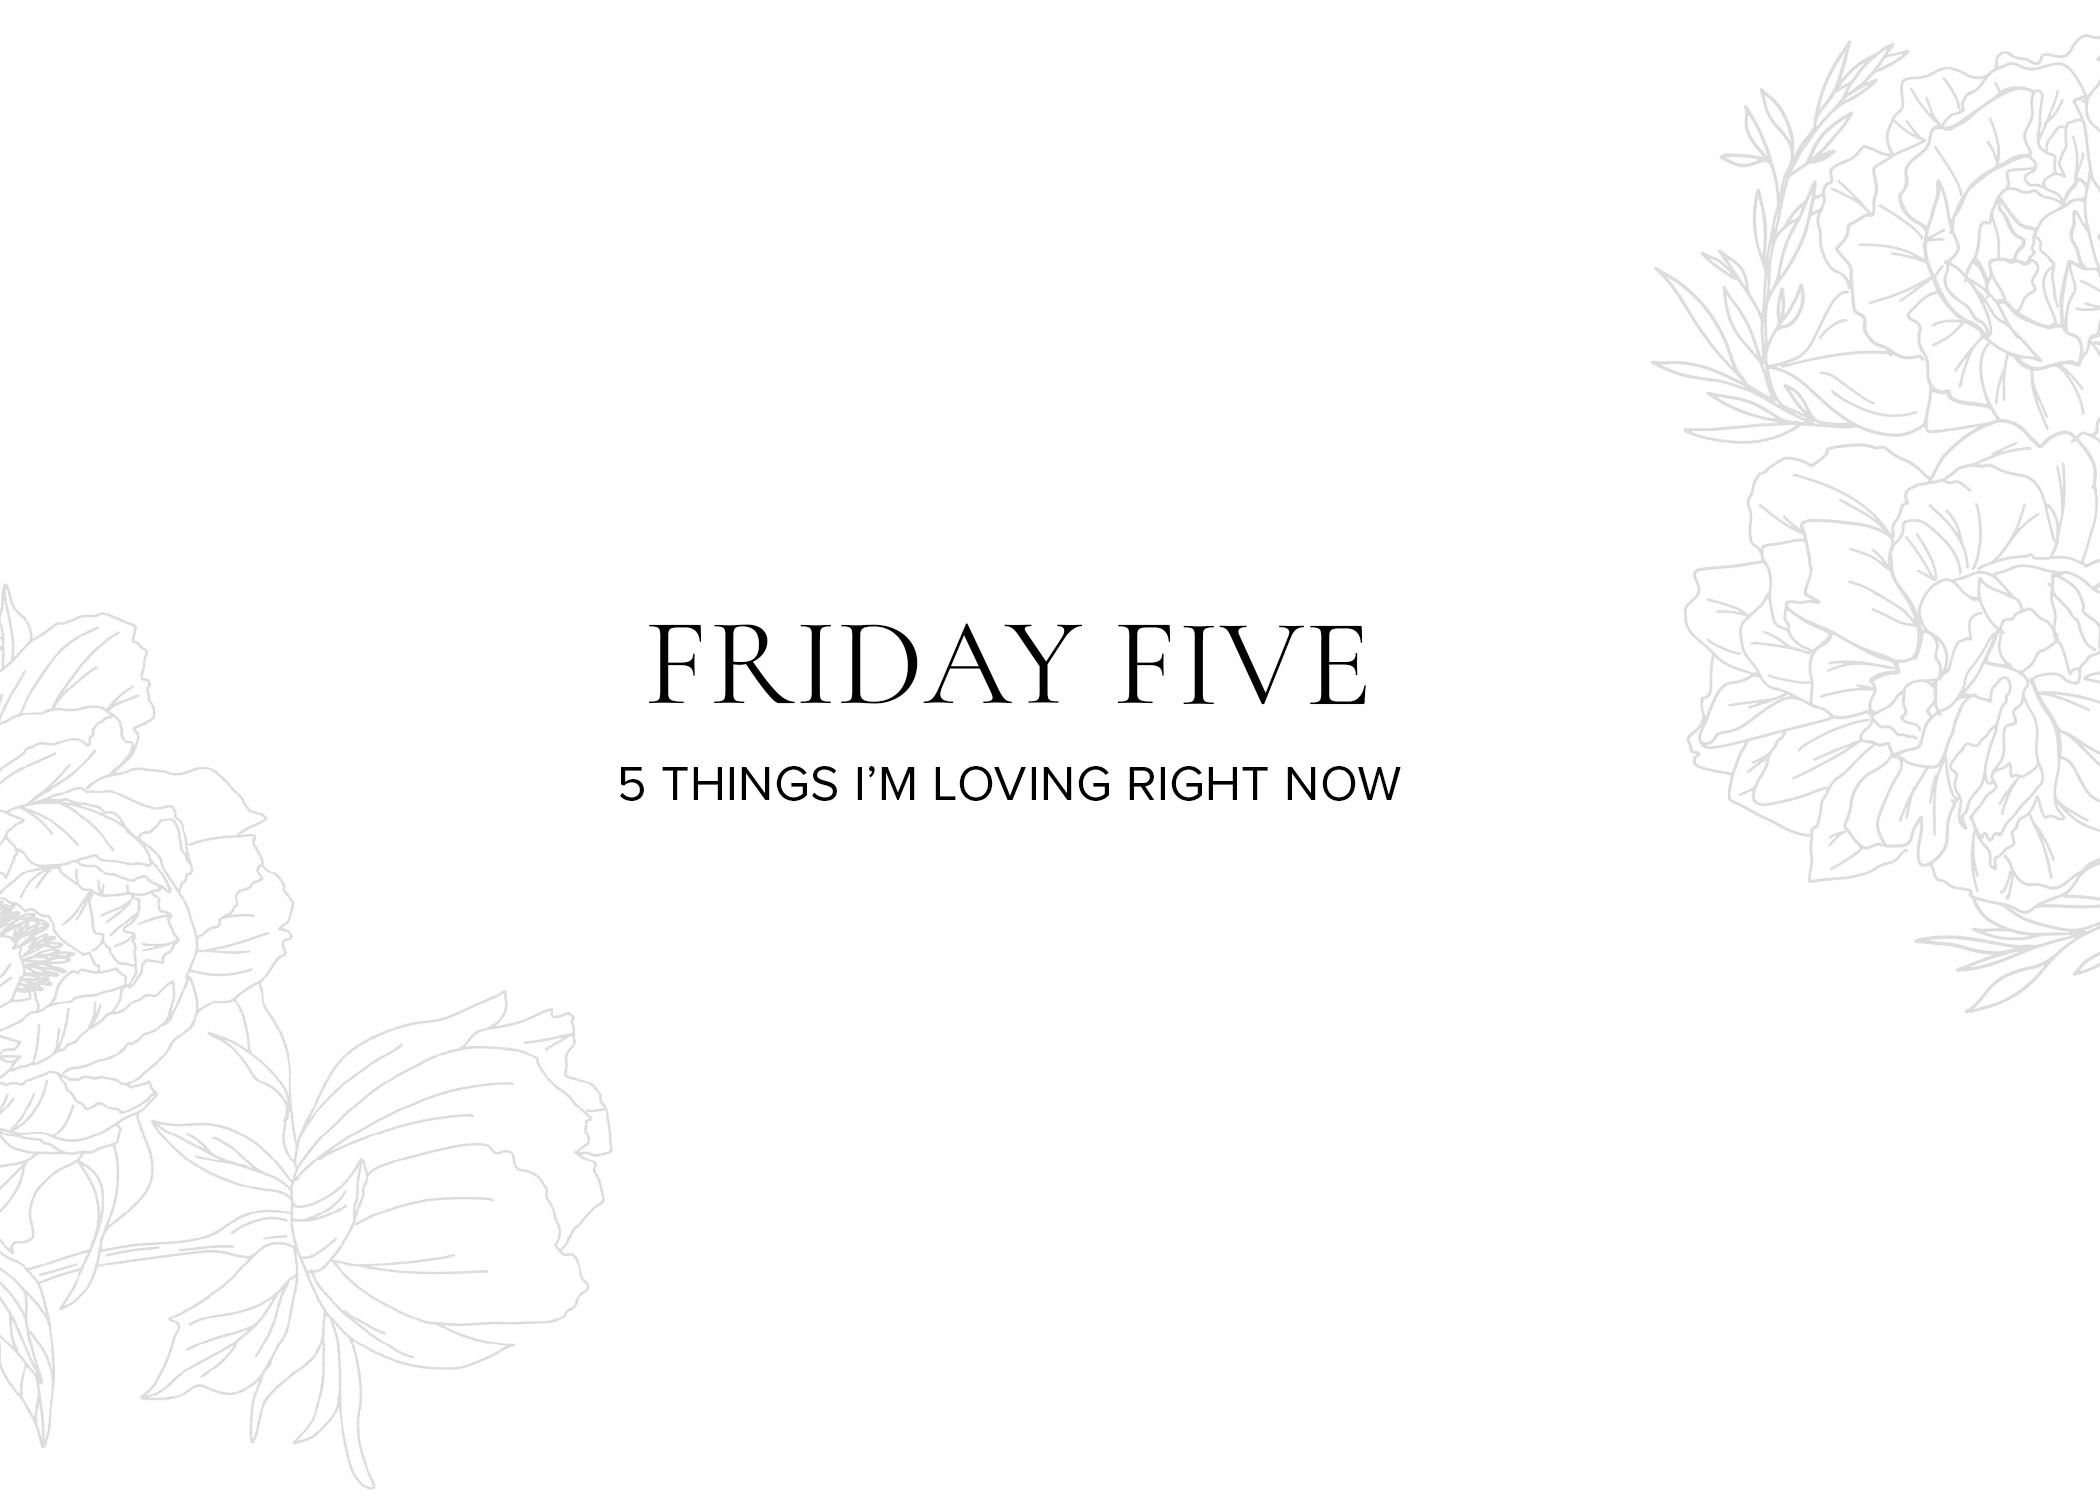 Friday-Five-LOVINGRIGHTNOW.jpg